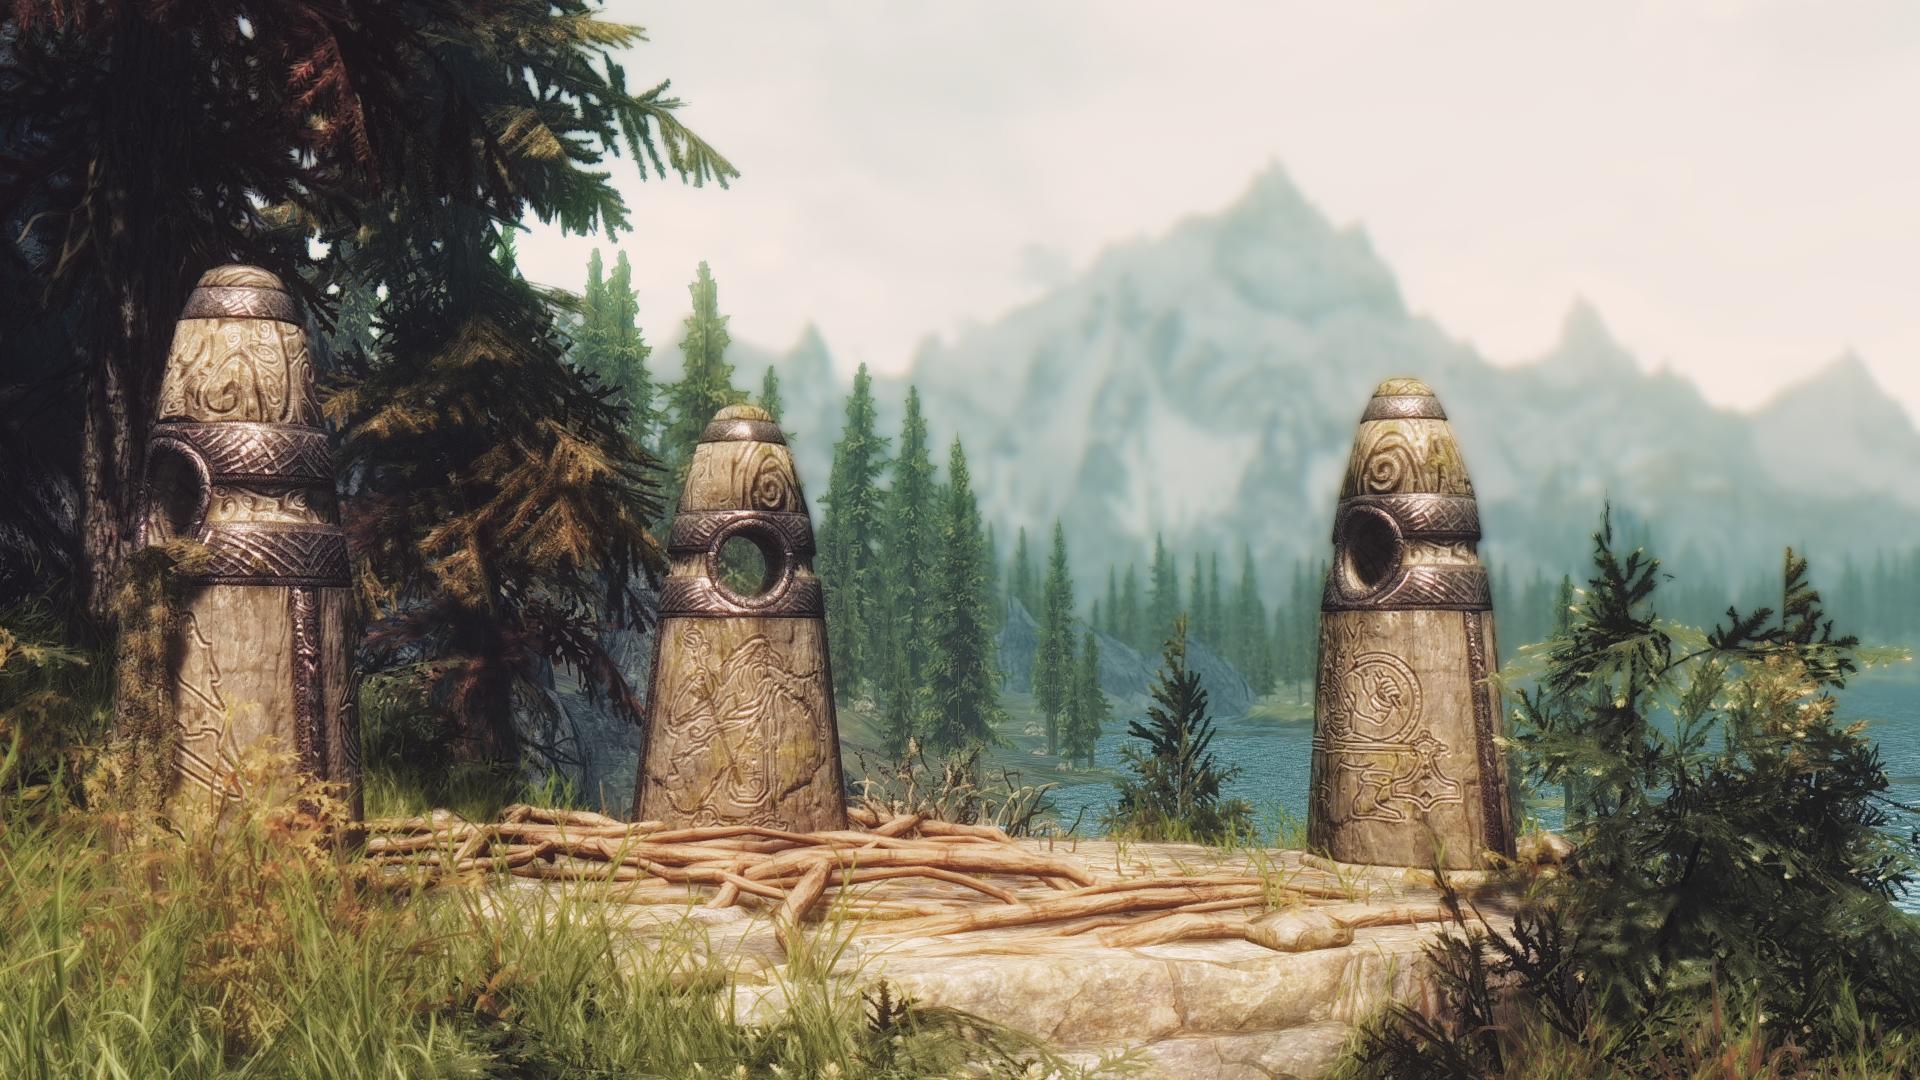 Fond d'écran : ENB, Sweetfx, The Elder Scrolls V: Skyrim, Saraansuum